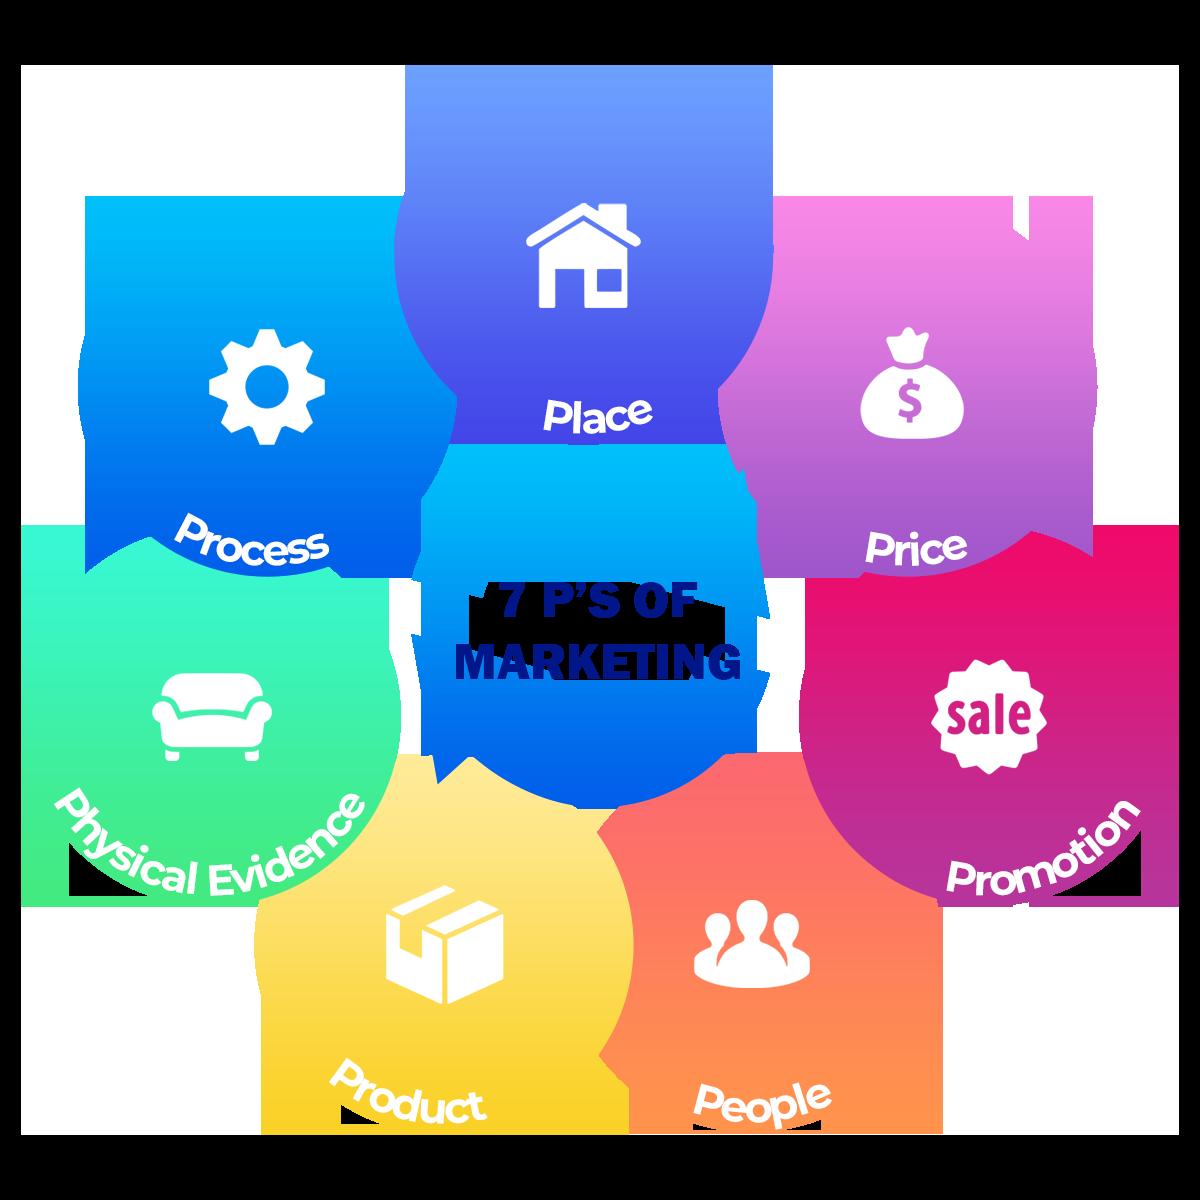 The Marketing Mix - 7 Ps of Marketing